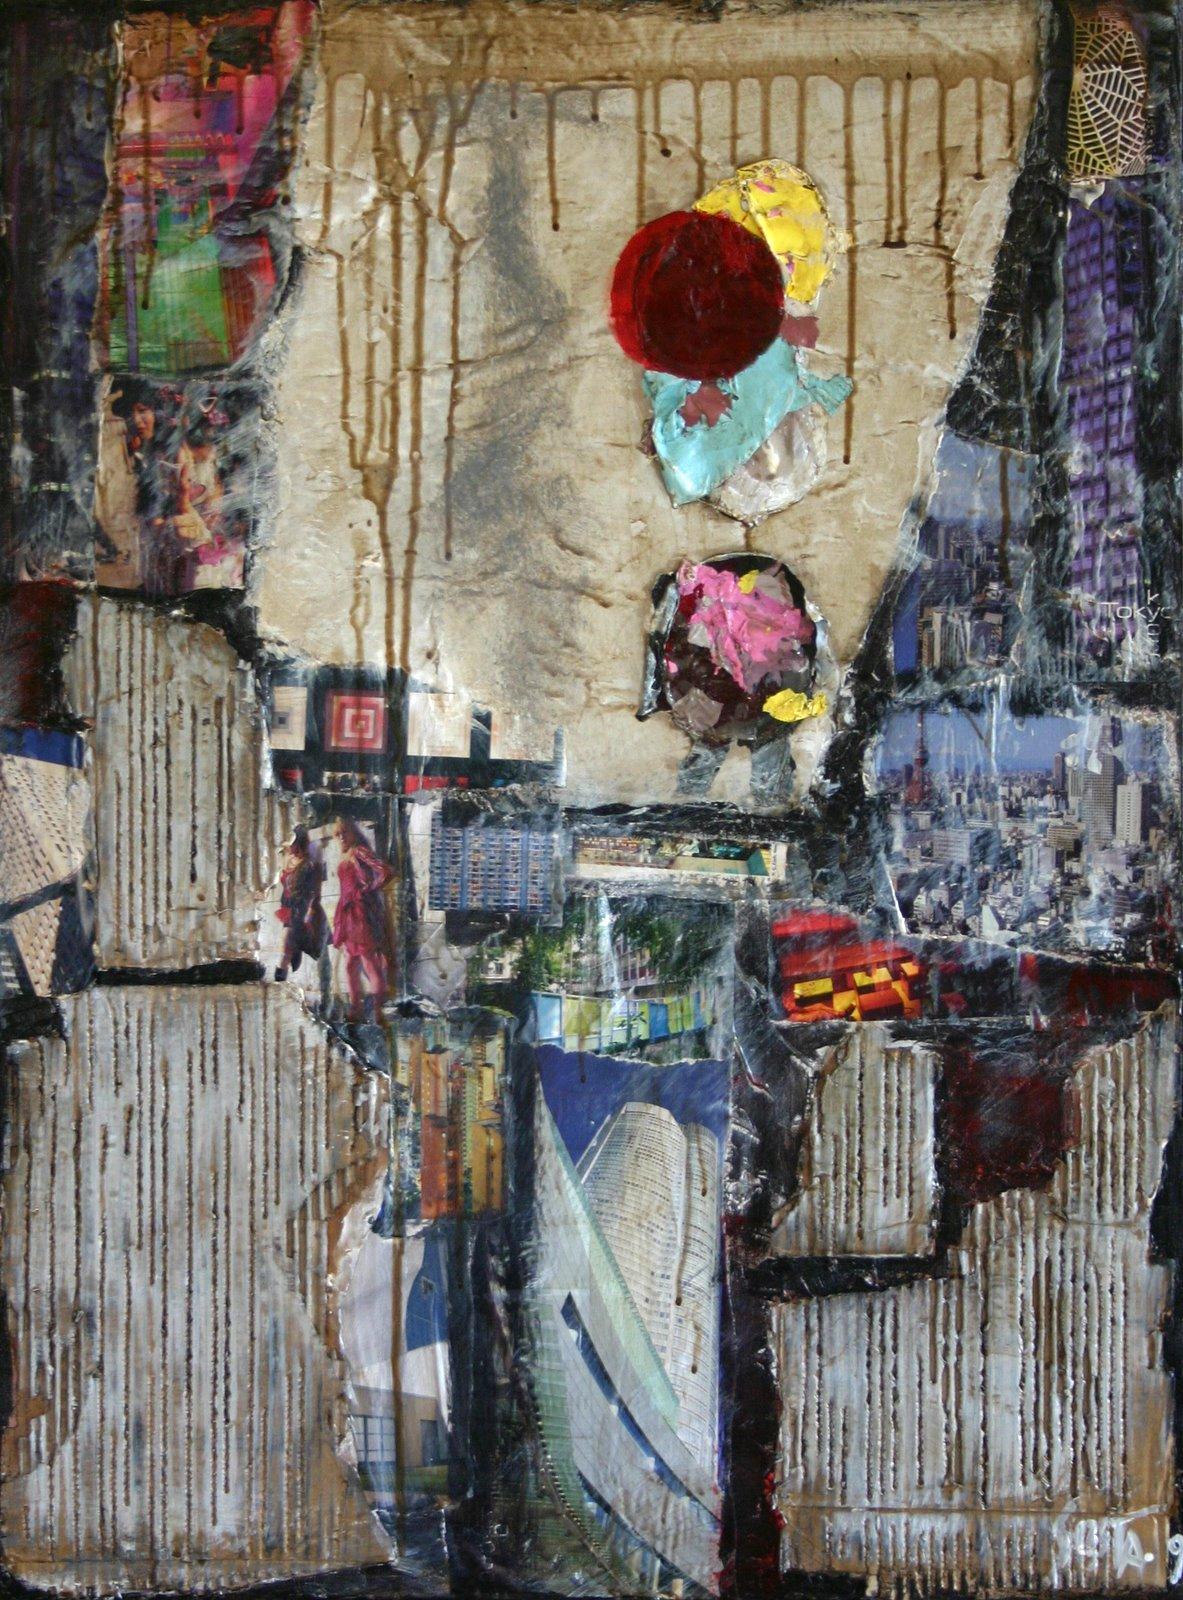 Tableau Contemporain, Tokyo. Sophie Costa, artiste peintre.